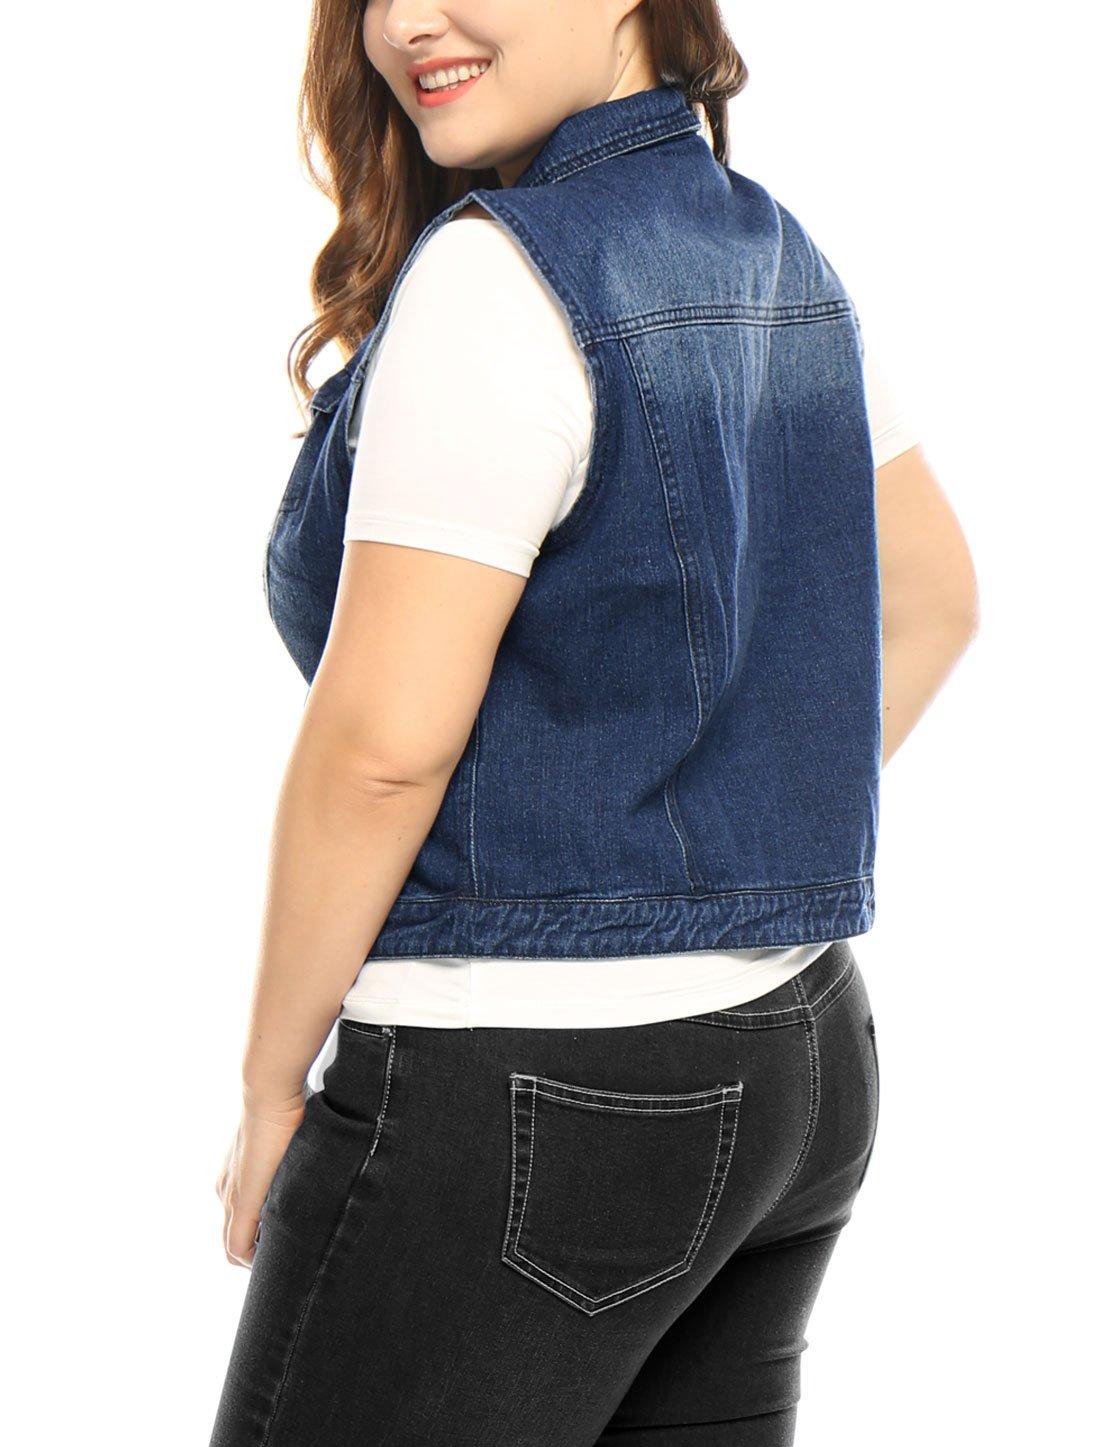 uxcell Women Plus Size Slim Fit Denim Vest Blue 1X by uxcell (Image #4)